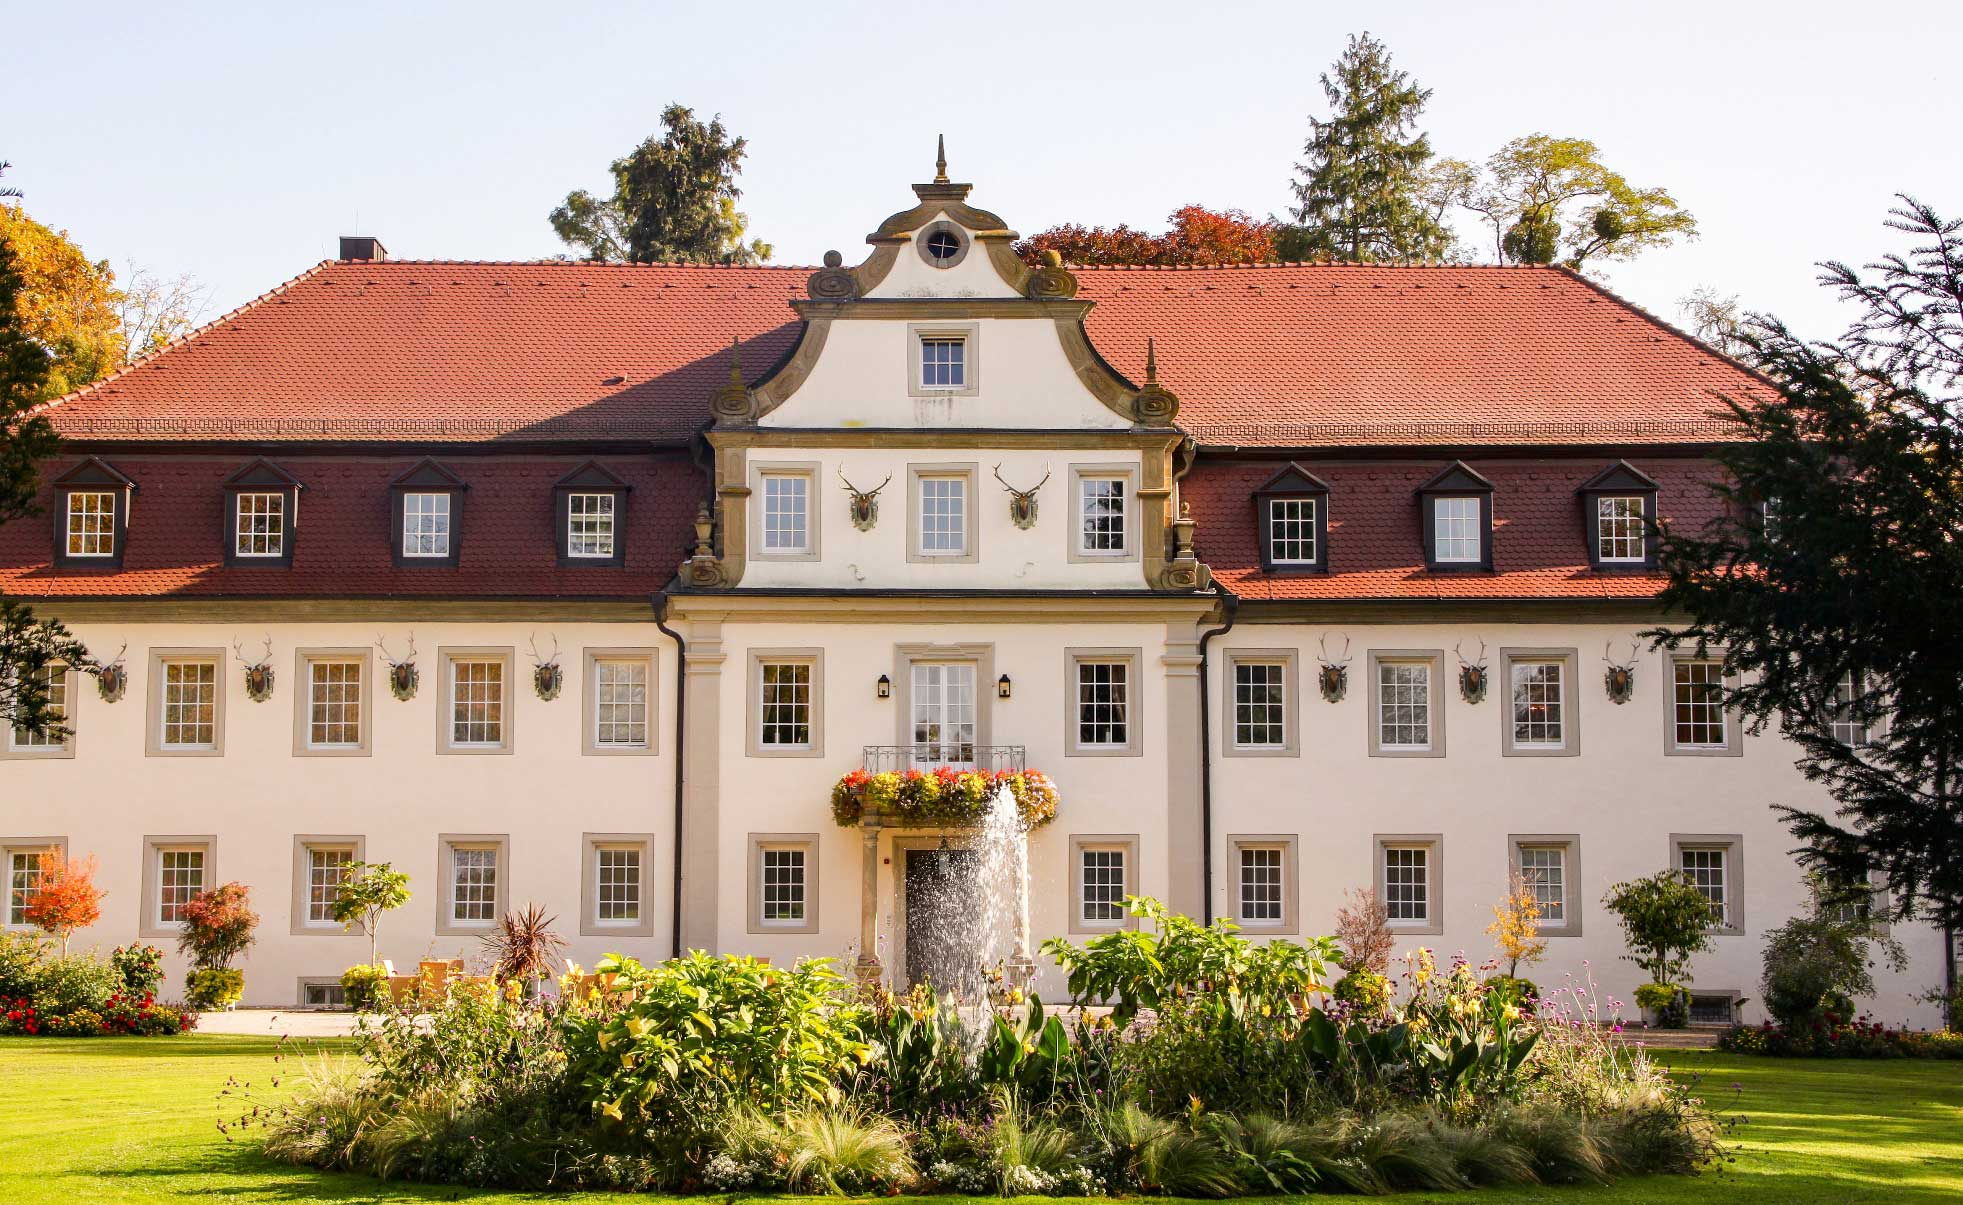 Wald & Schlosshotel Friedrichsruhe, Hohenloher Ebene